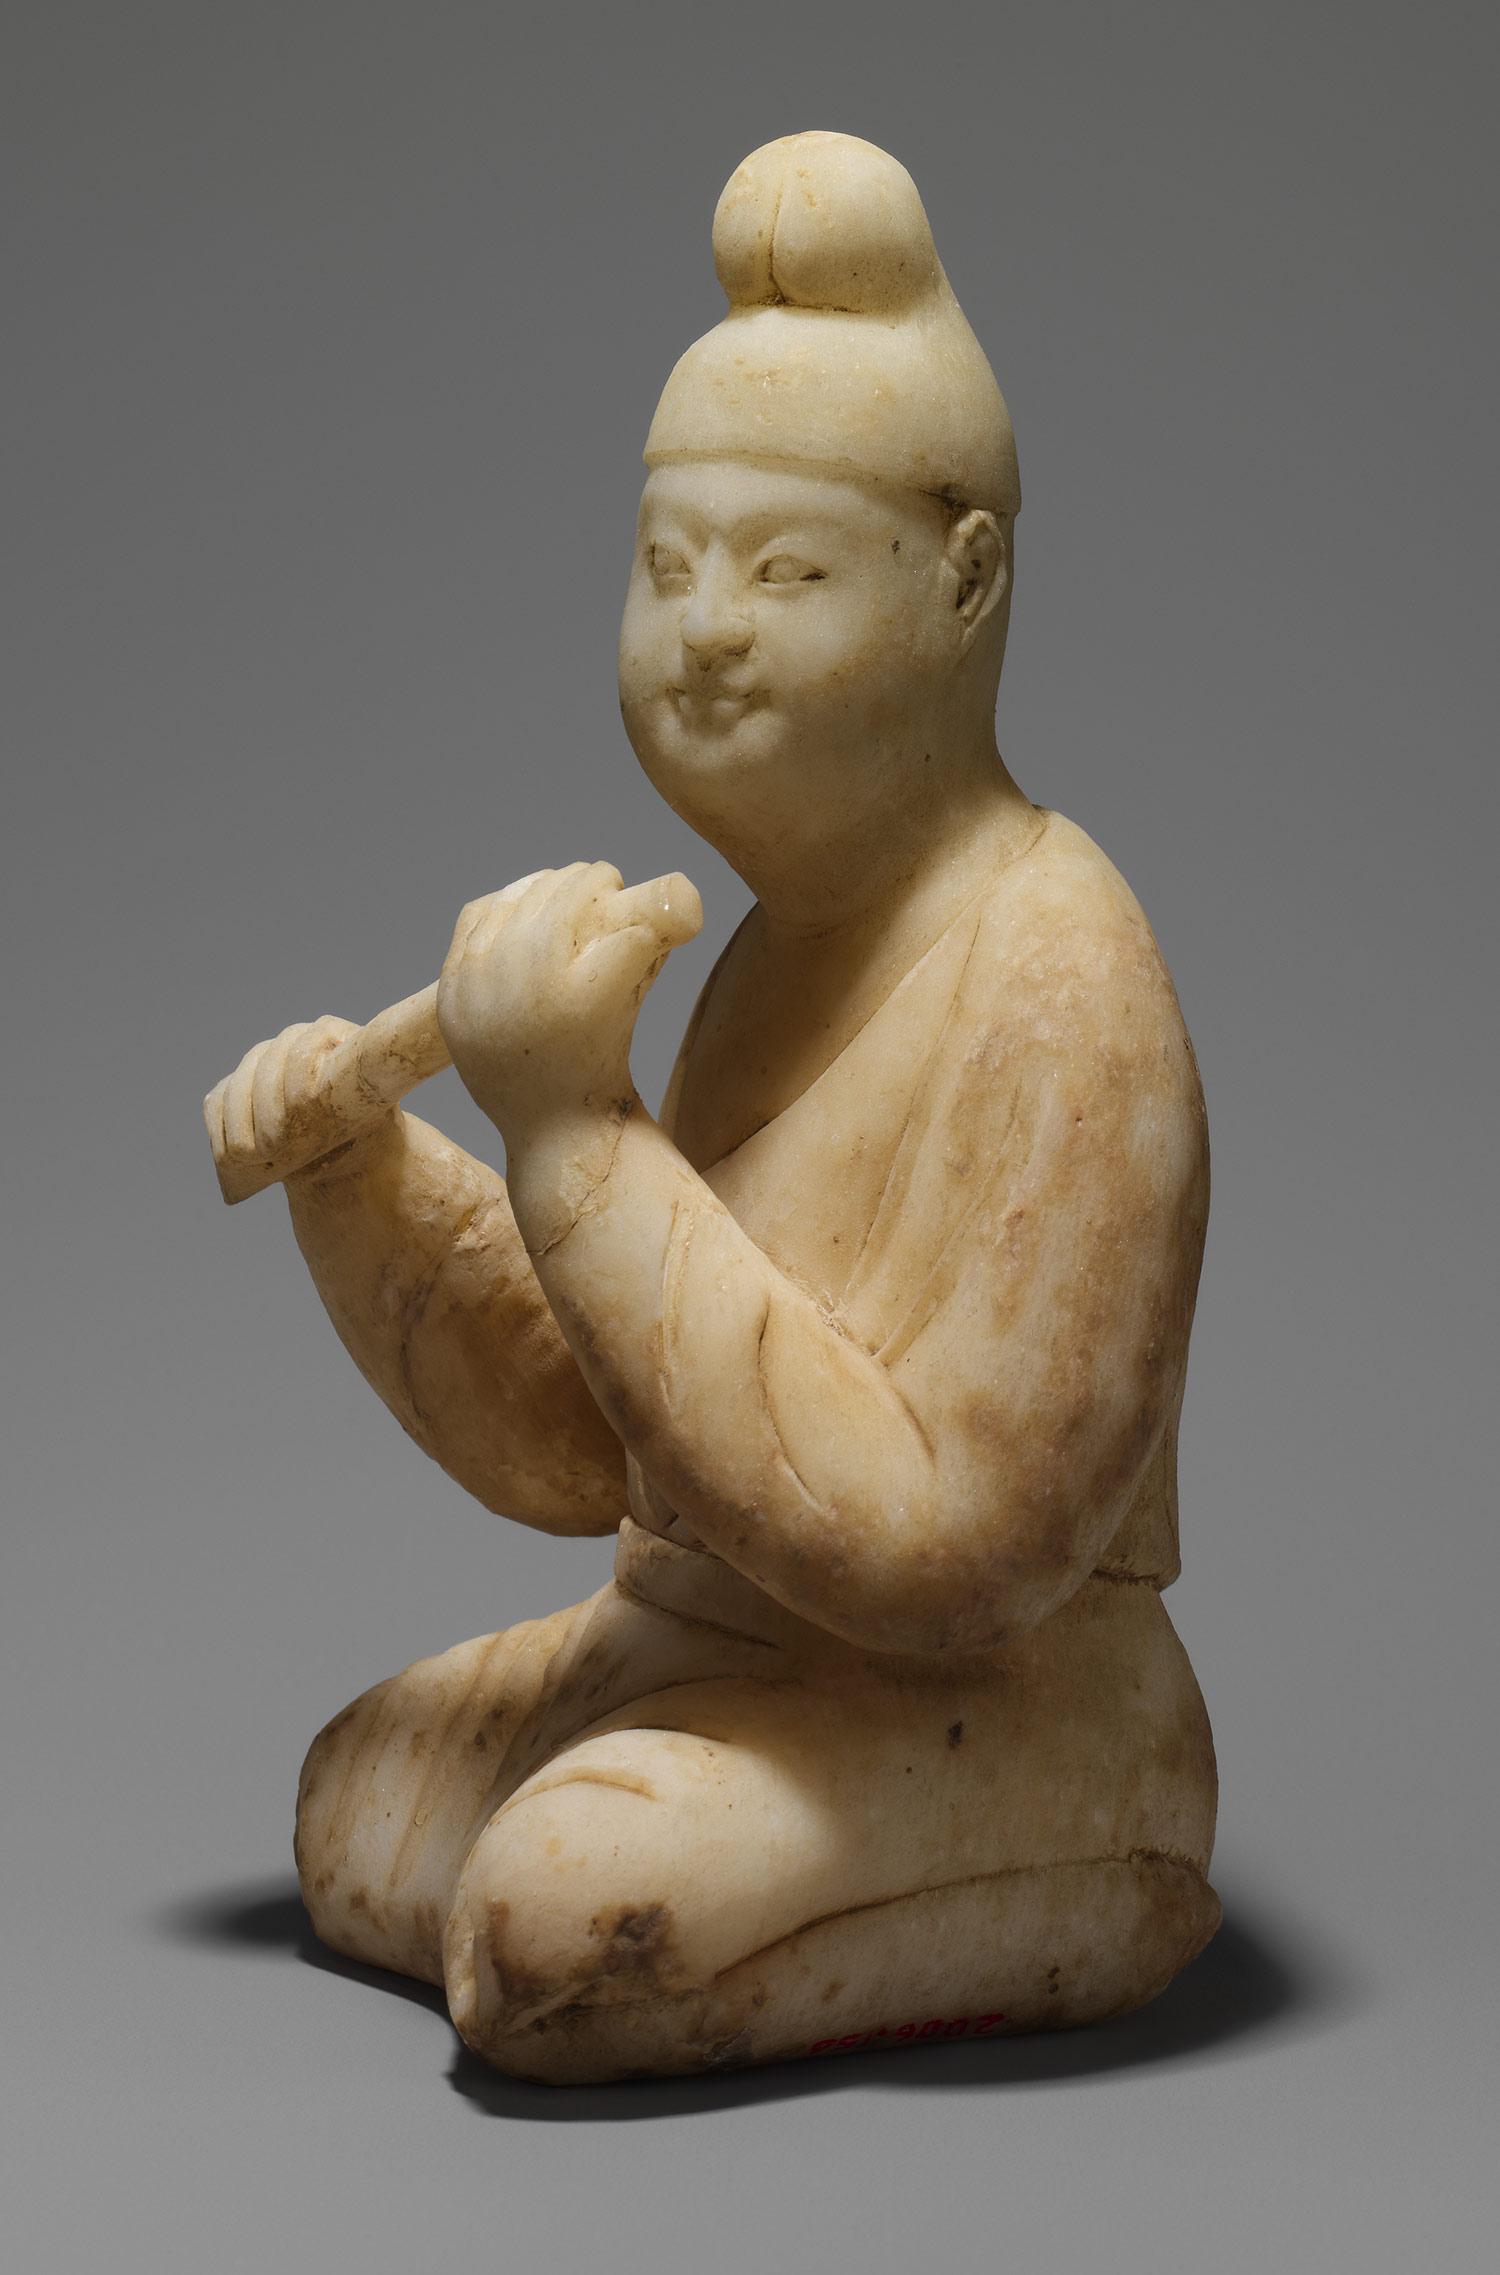 Asian statue woman - 3 part 2